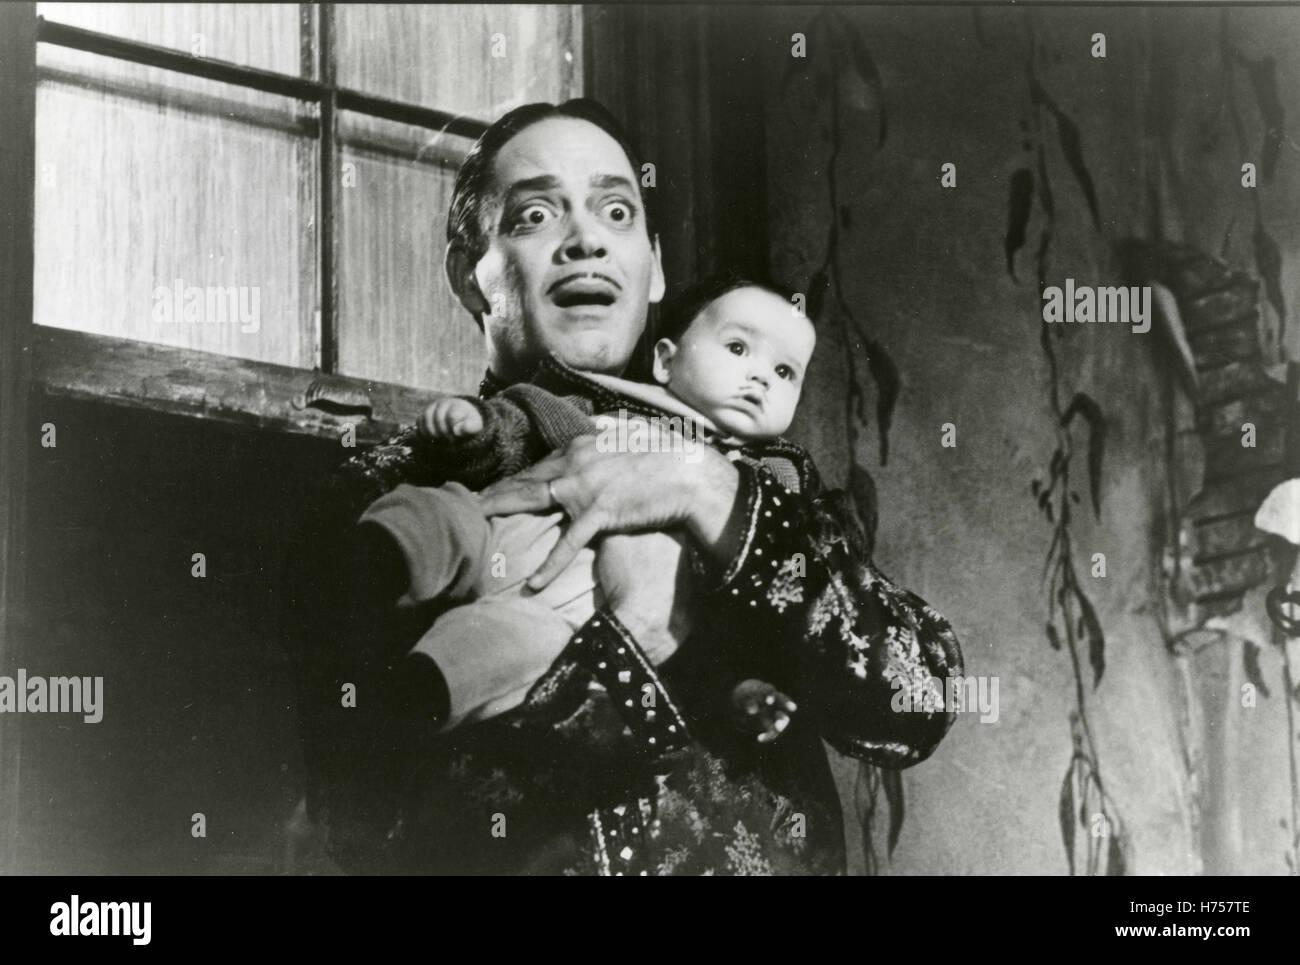 Roul Julia Gomez Addams, Addams Family Values - Stock Image